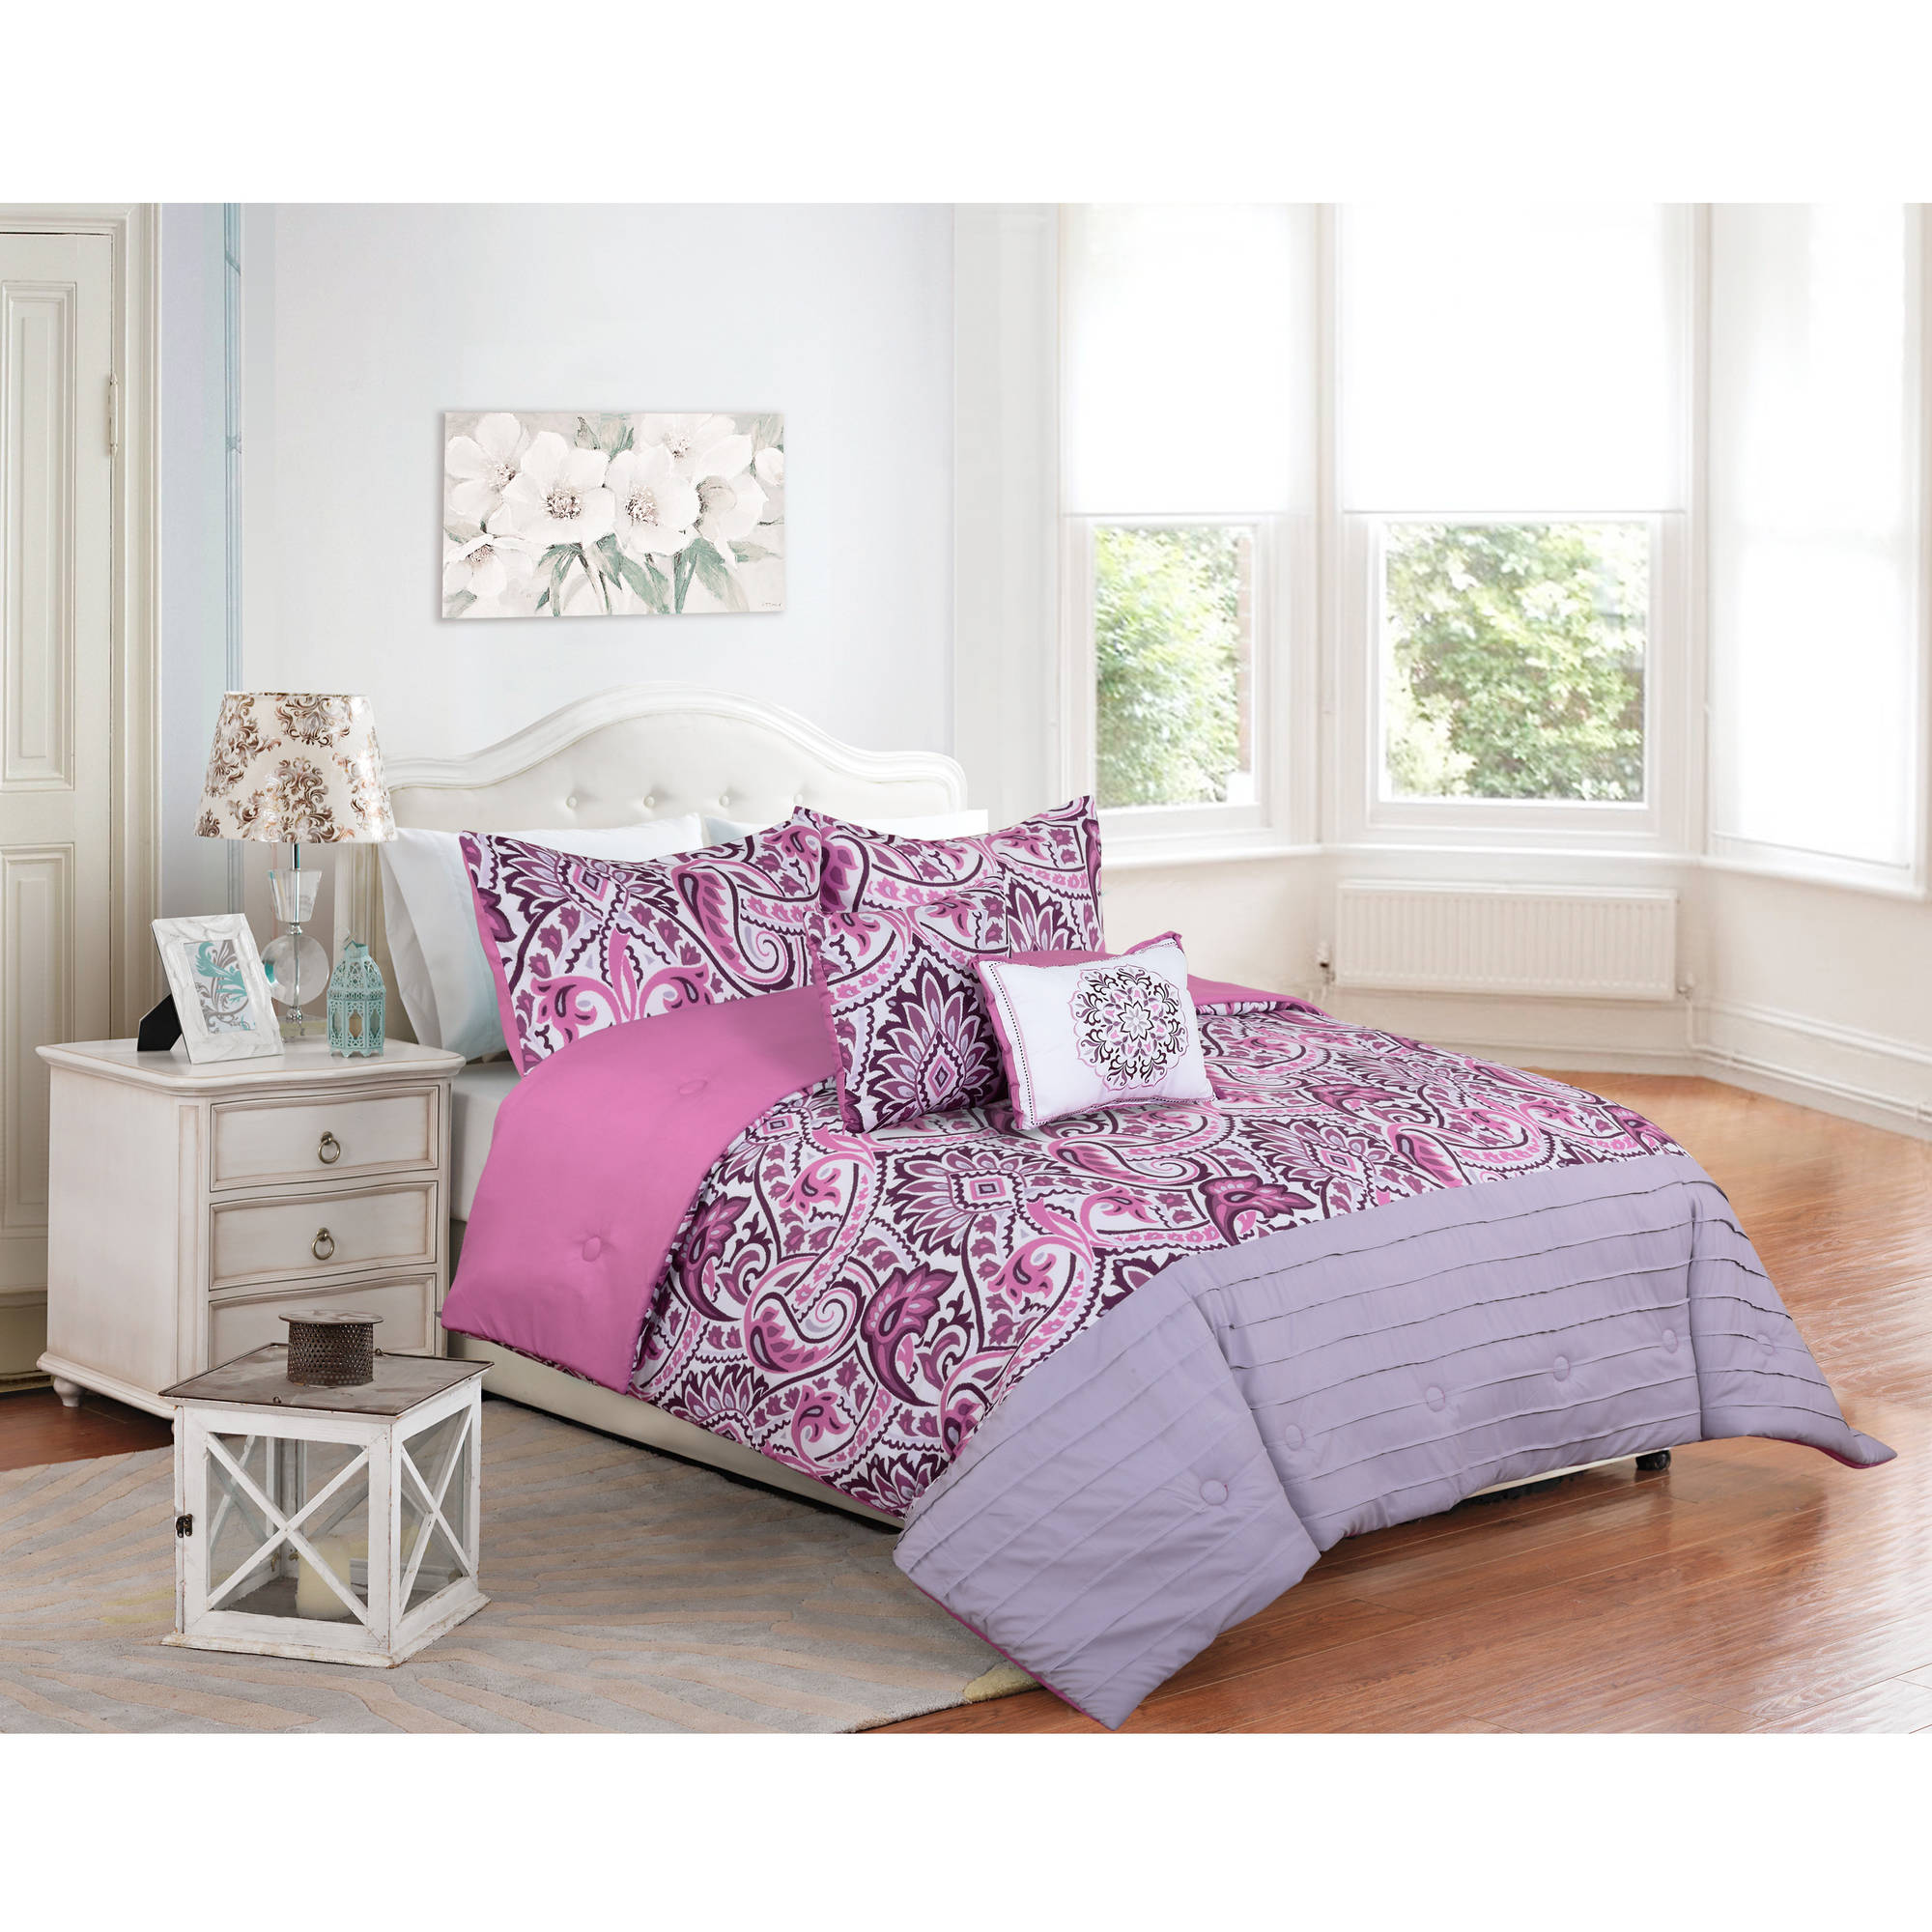 Better Homes & Gardens Full or Queen Ikat Scroll Comforter Set, 5 Piece